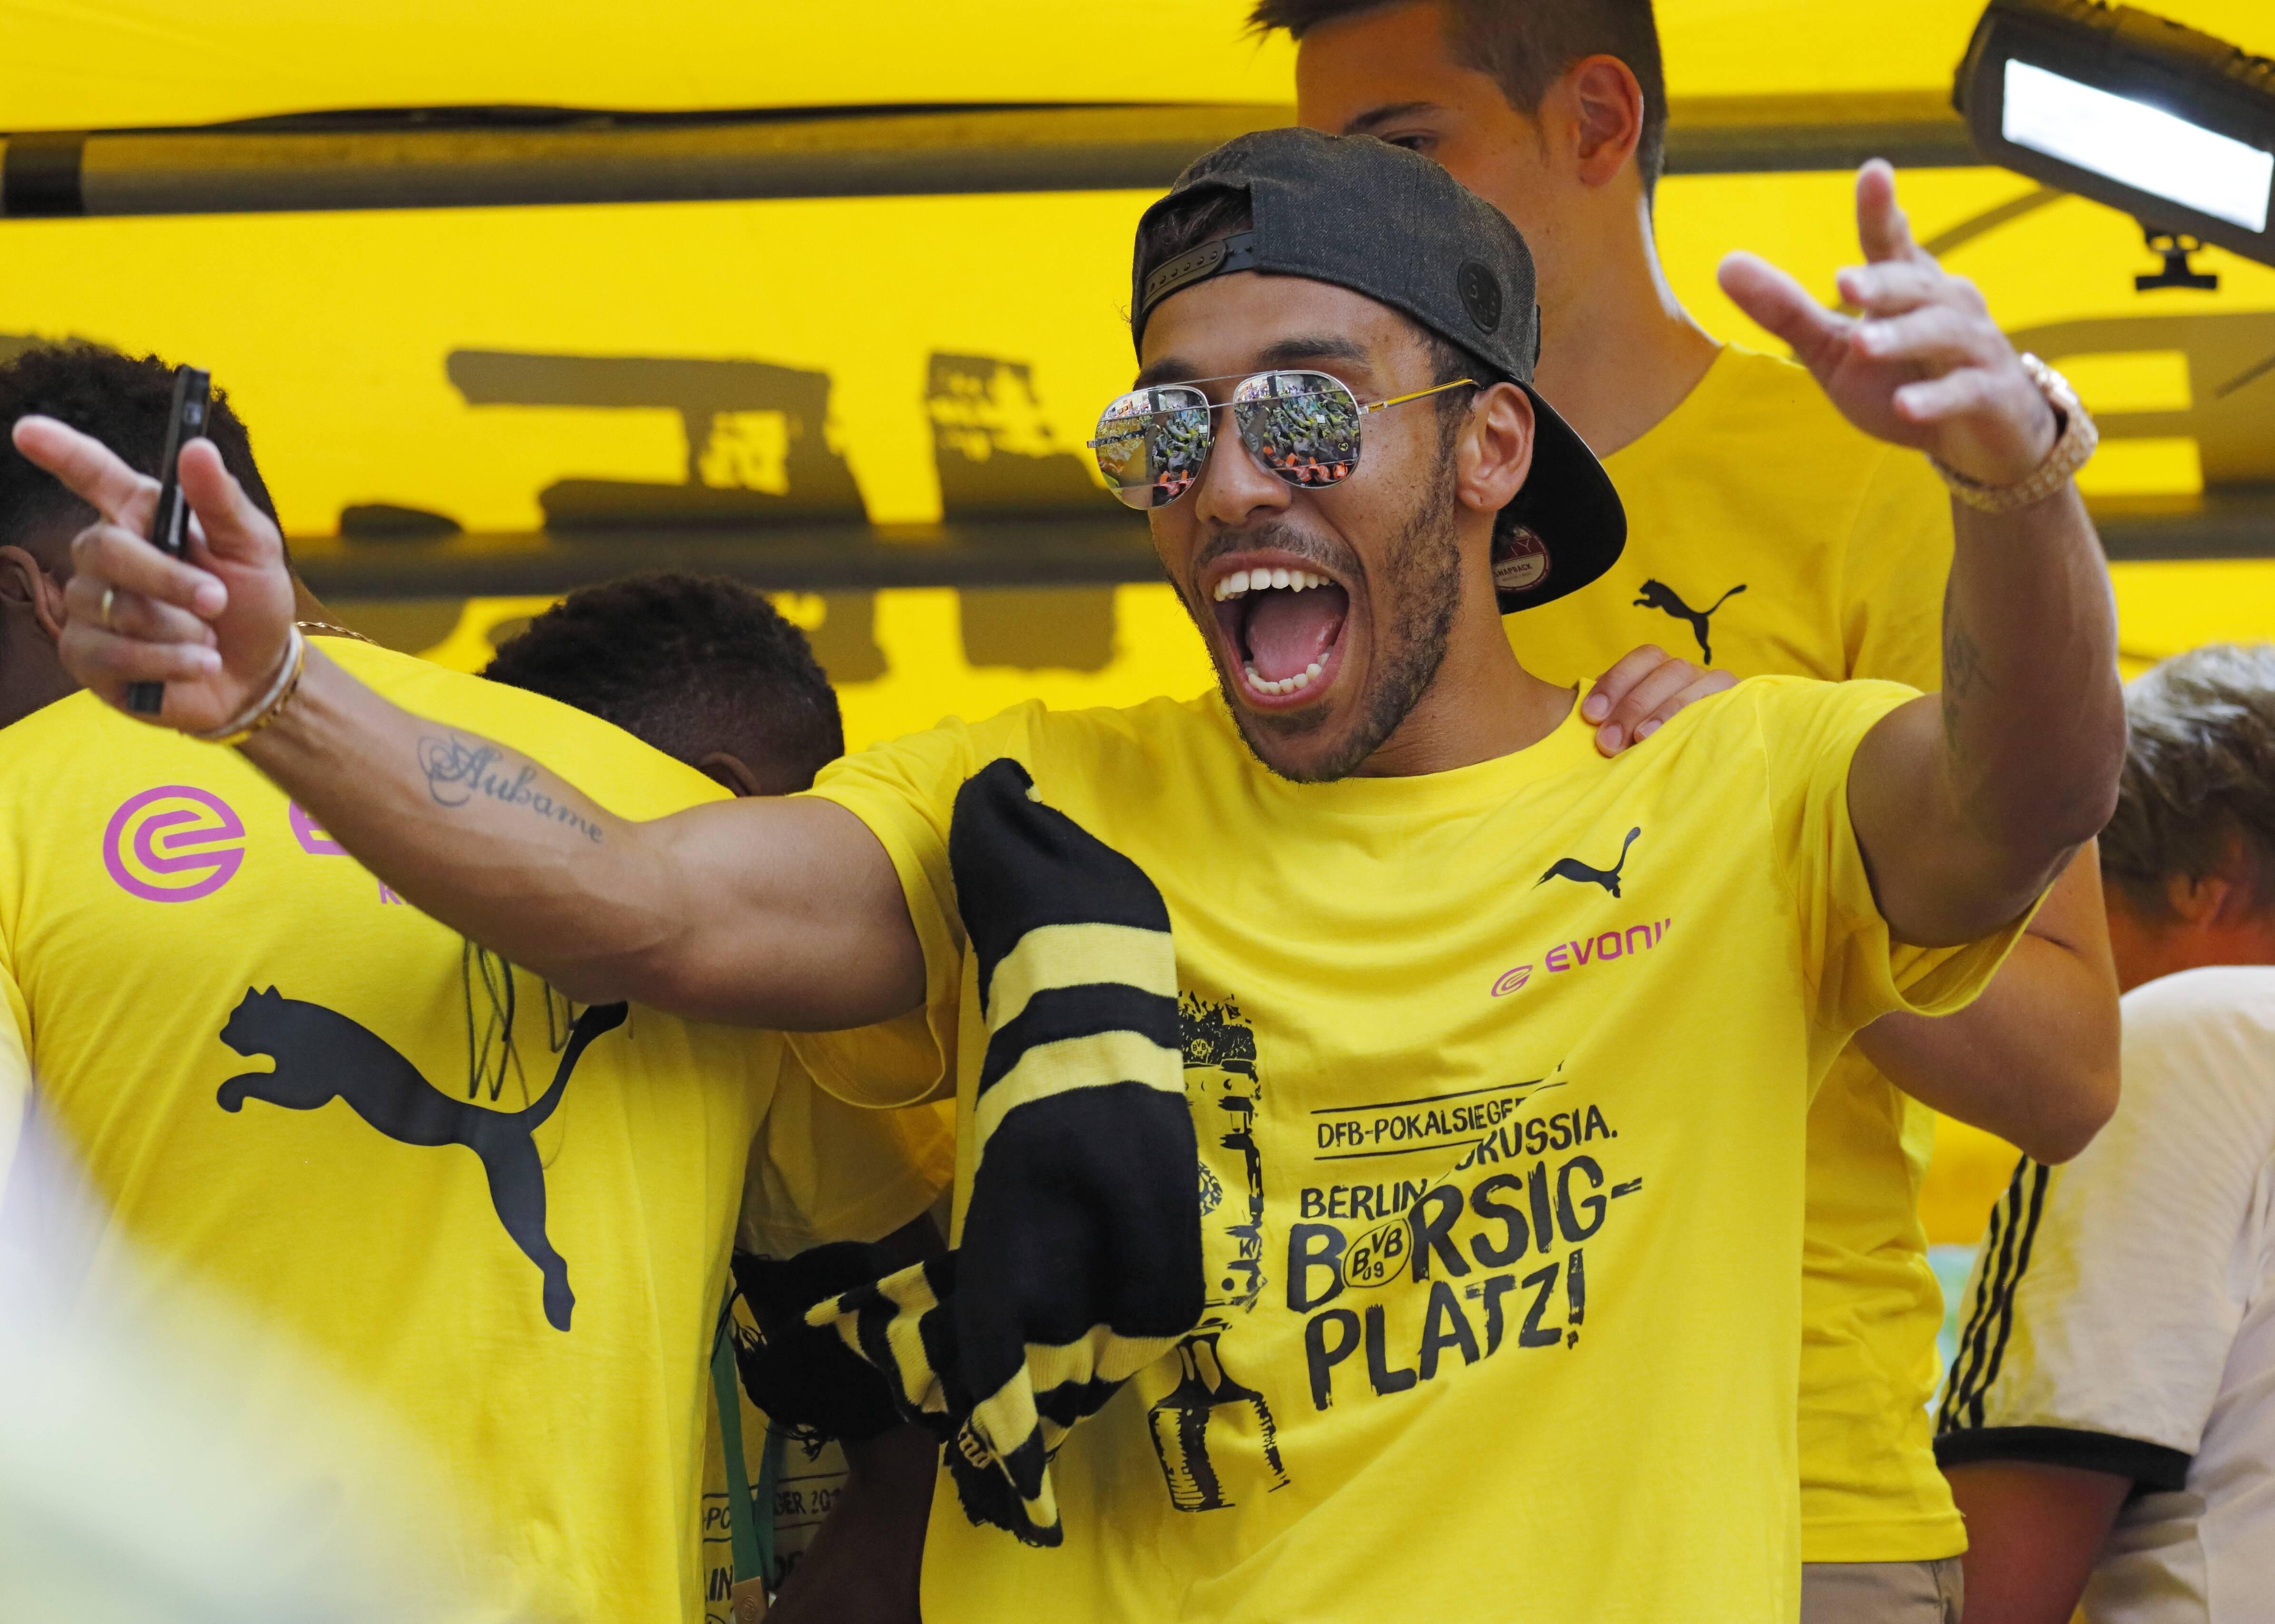 Bild zu Pierre-Emerick Aubameyang, Borussia Dortmund, Transfer News